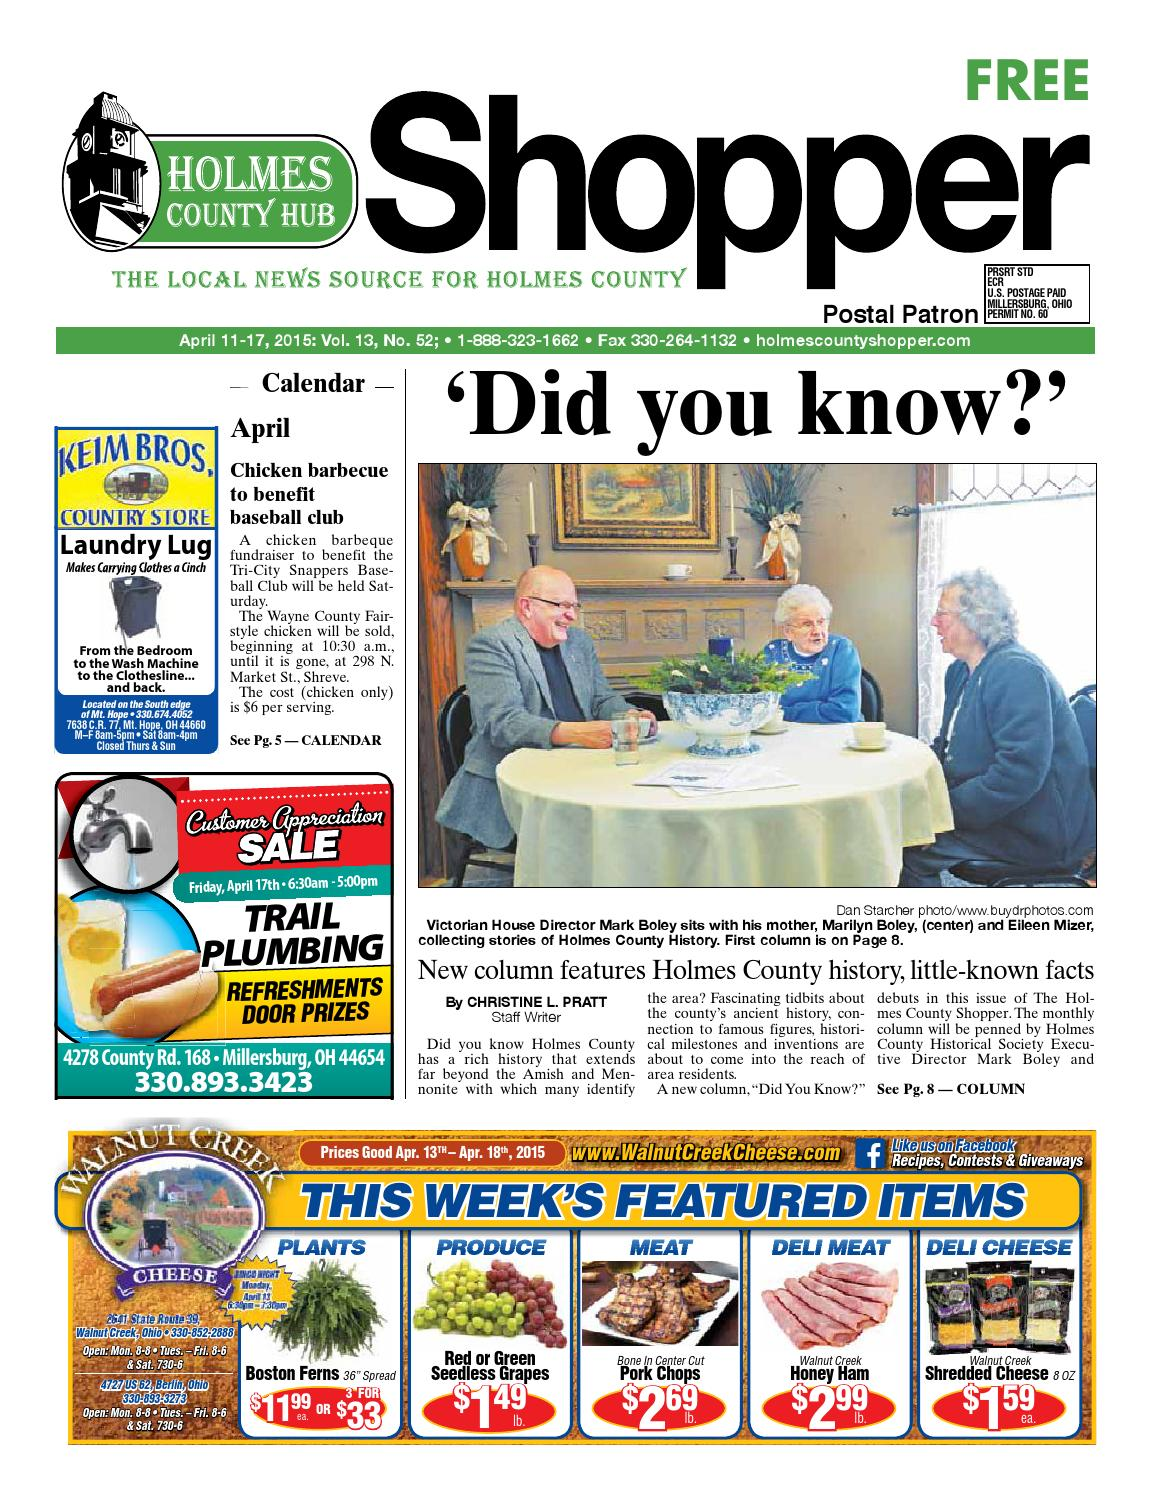 Holmes County Hub Shopper April 11 2015 By GateHouse Media NEO